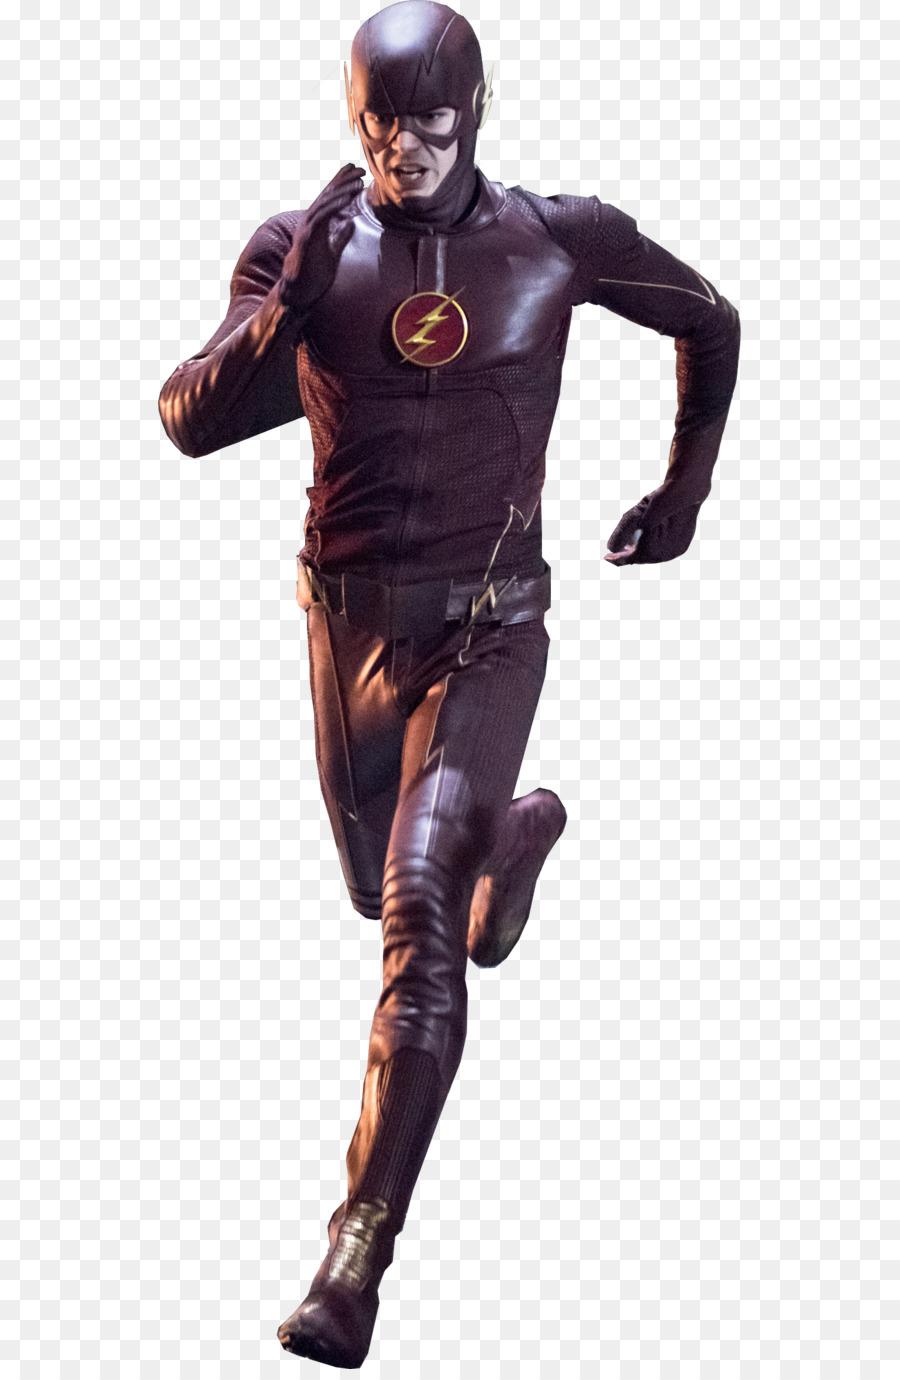 The Flash Clip Art - Krrish-The Flash Clip art - krrish-17